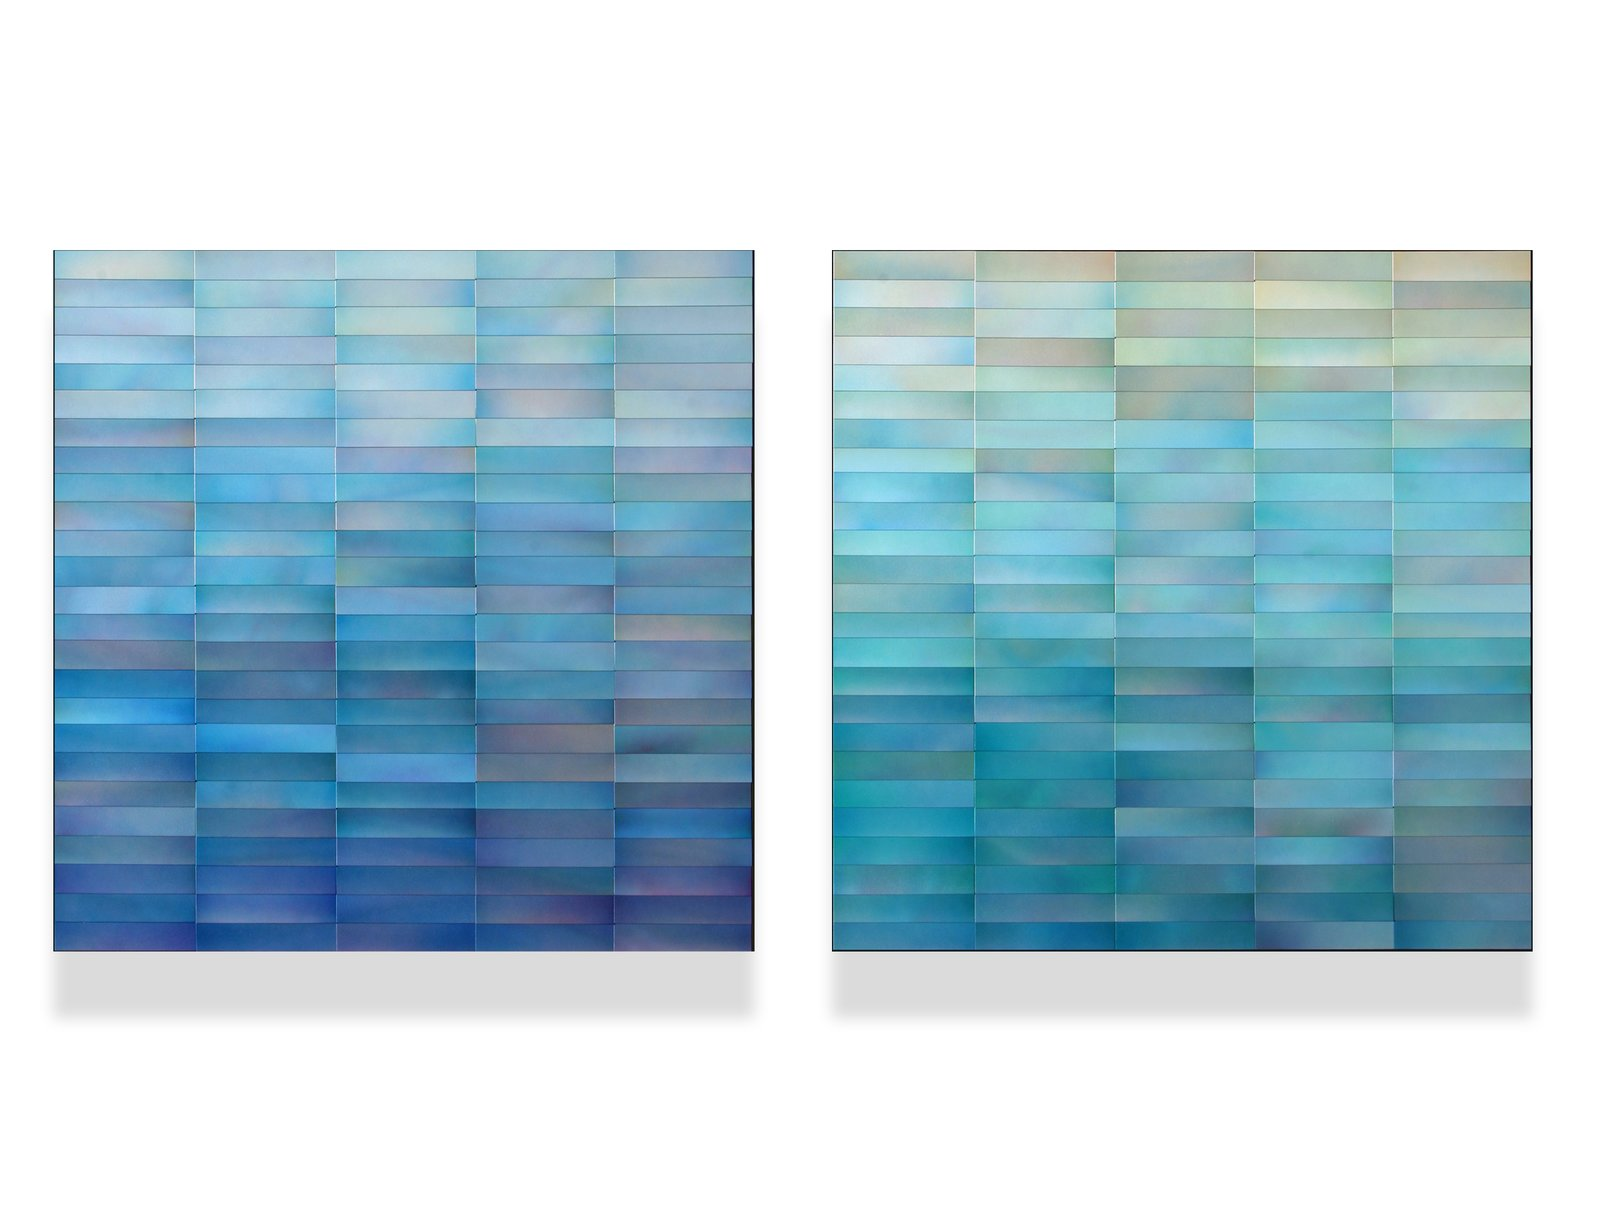 "(2) 30"" x 30"" x 2"" each, painted metal on wood panel  Cascade Series by Moran Brown Art"